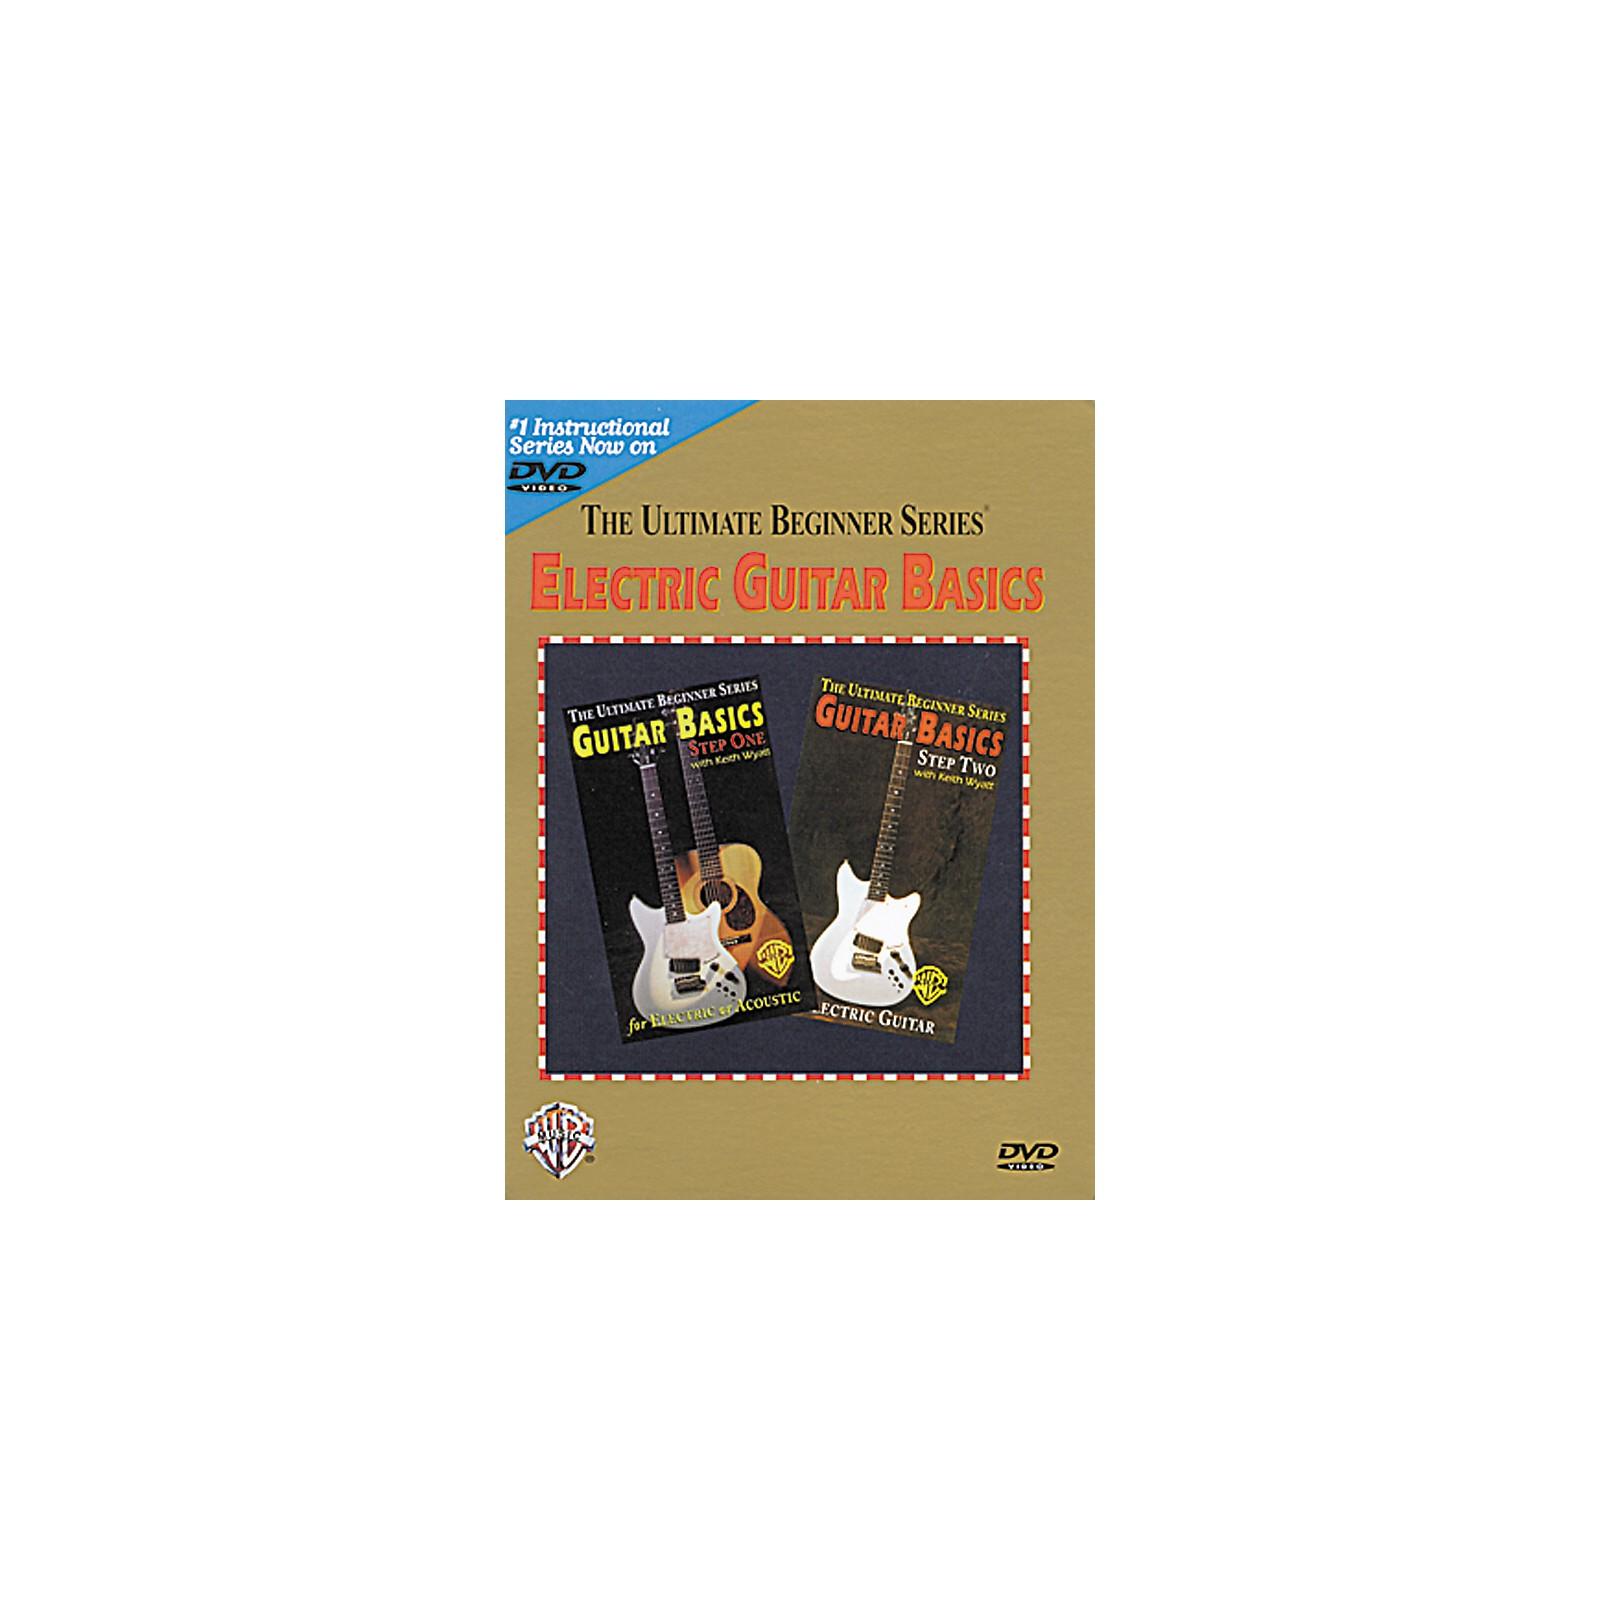 Warner Bros Ultimate Beginner Series - Electric Guitar Basics (DVD)